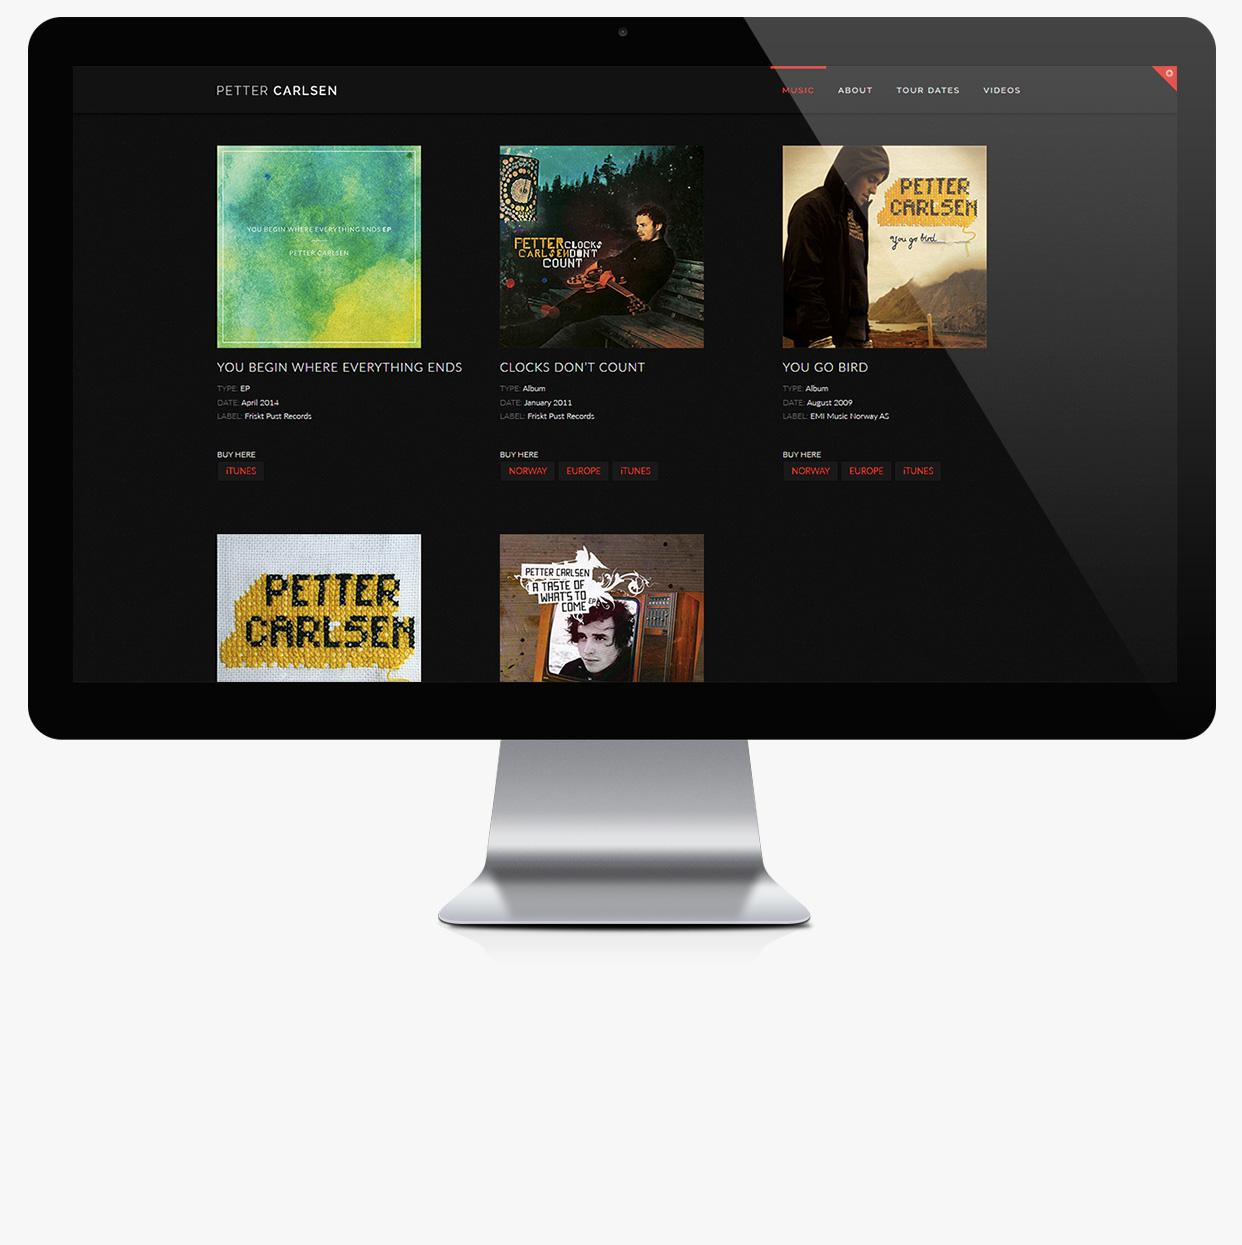 pettercarlsen-web-music-2